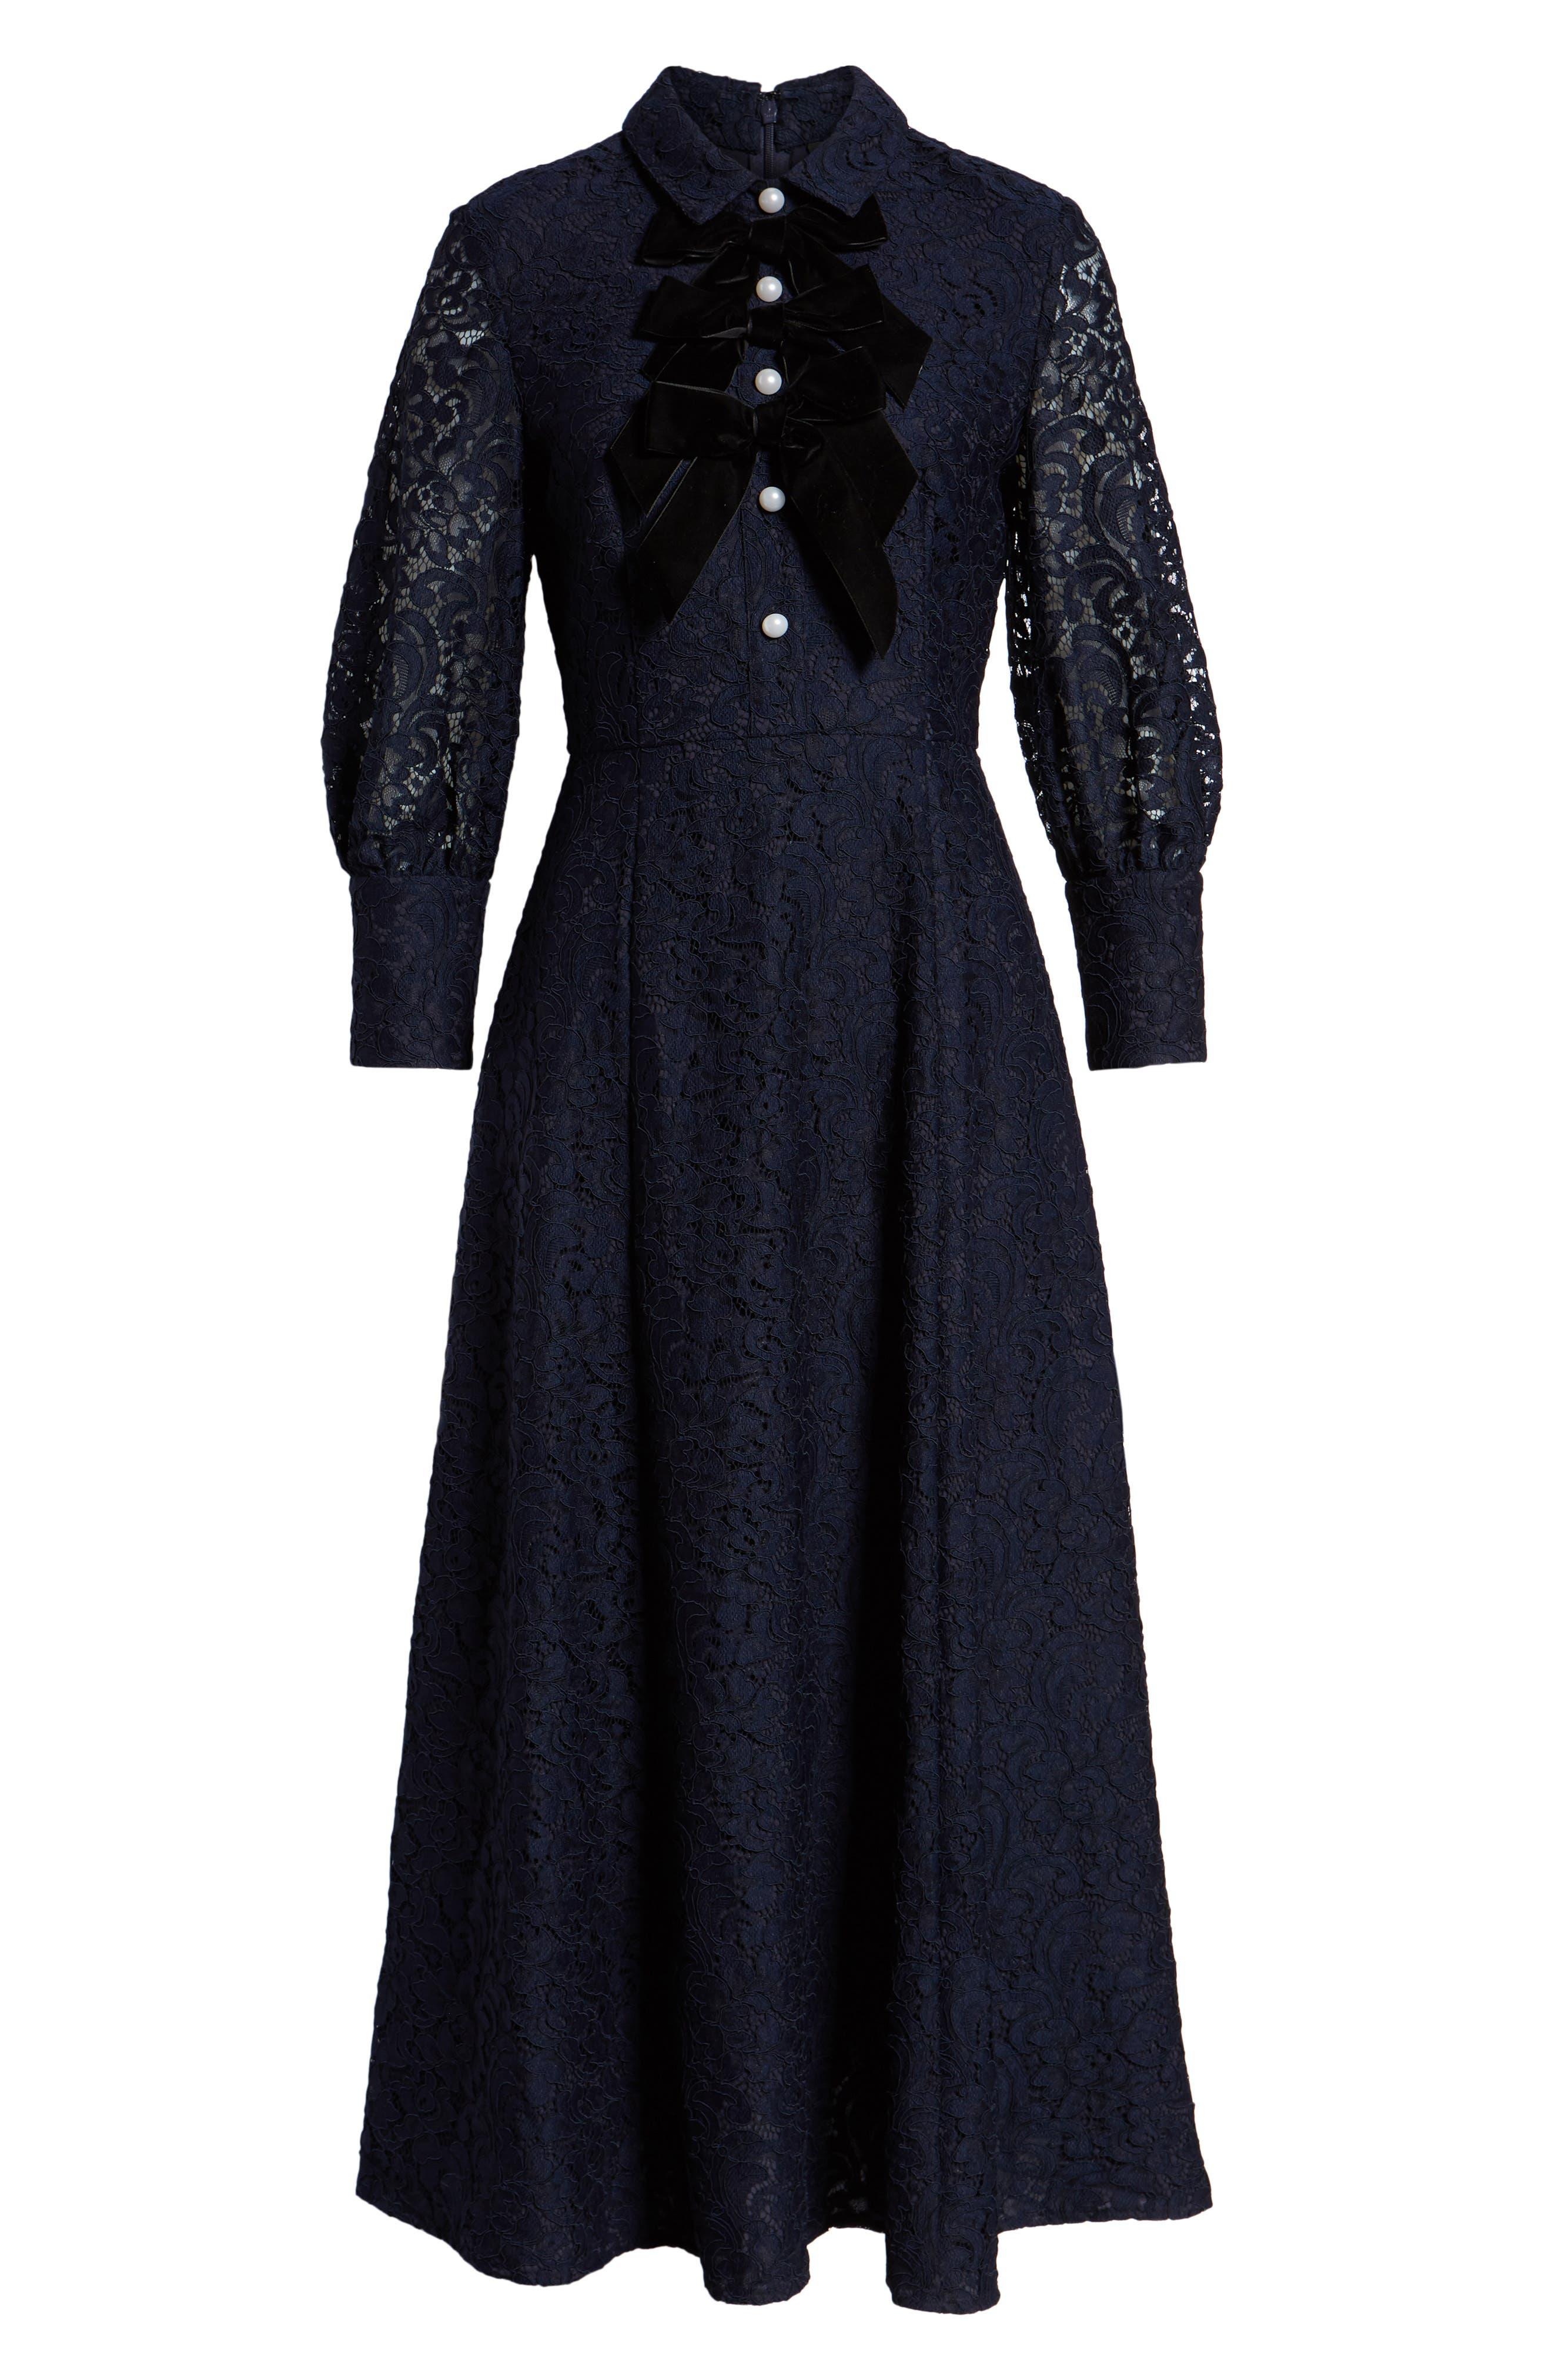 x Atlantic-Pacific Bow Detail Lace Midi Dress,                             Alternate thumbnail 7, color,                             NAVY